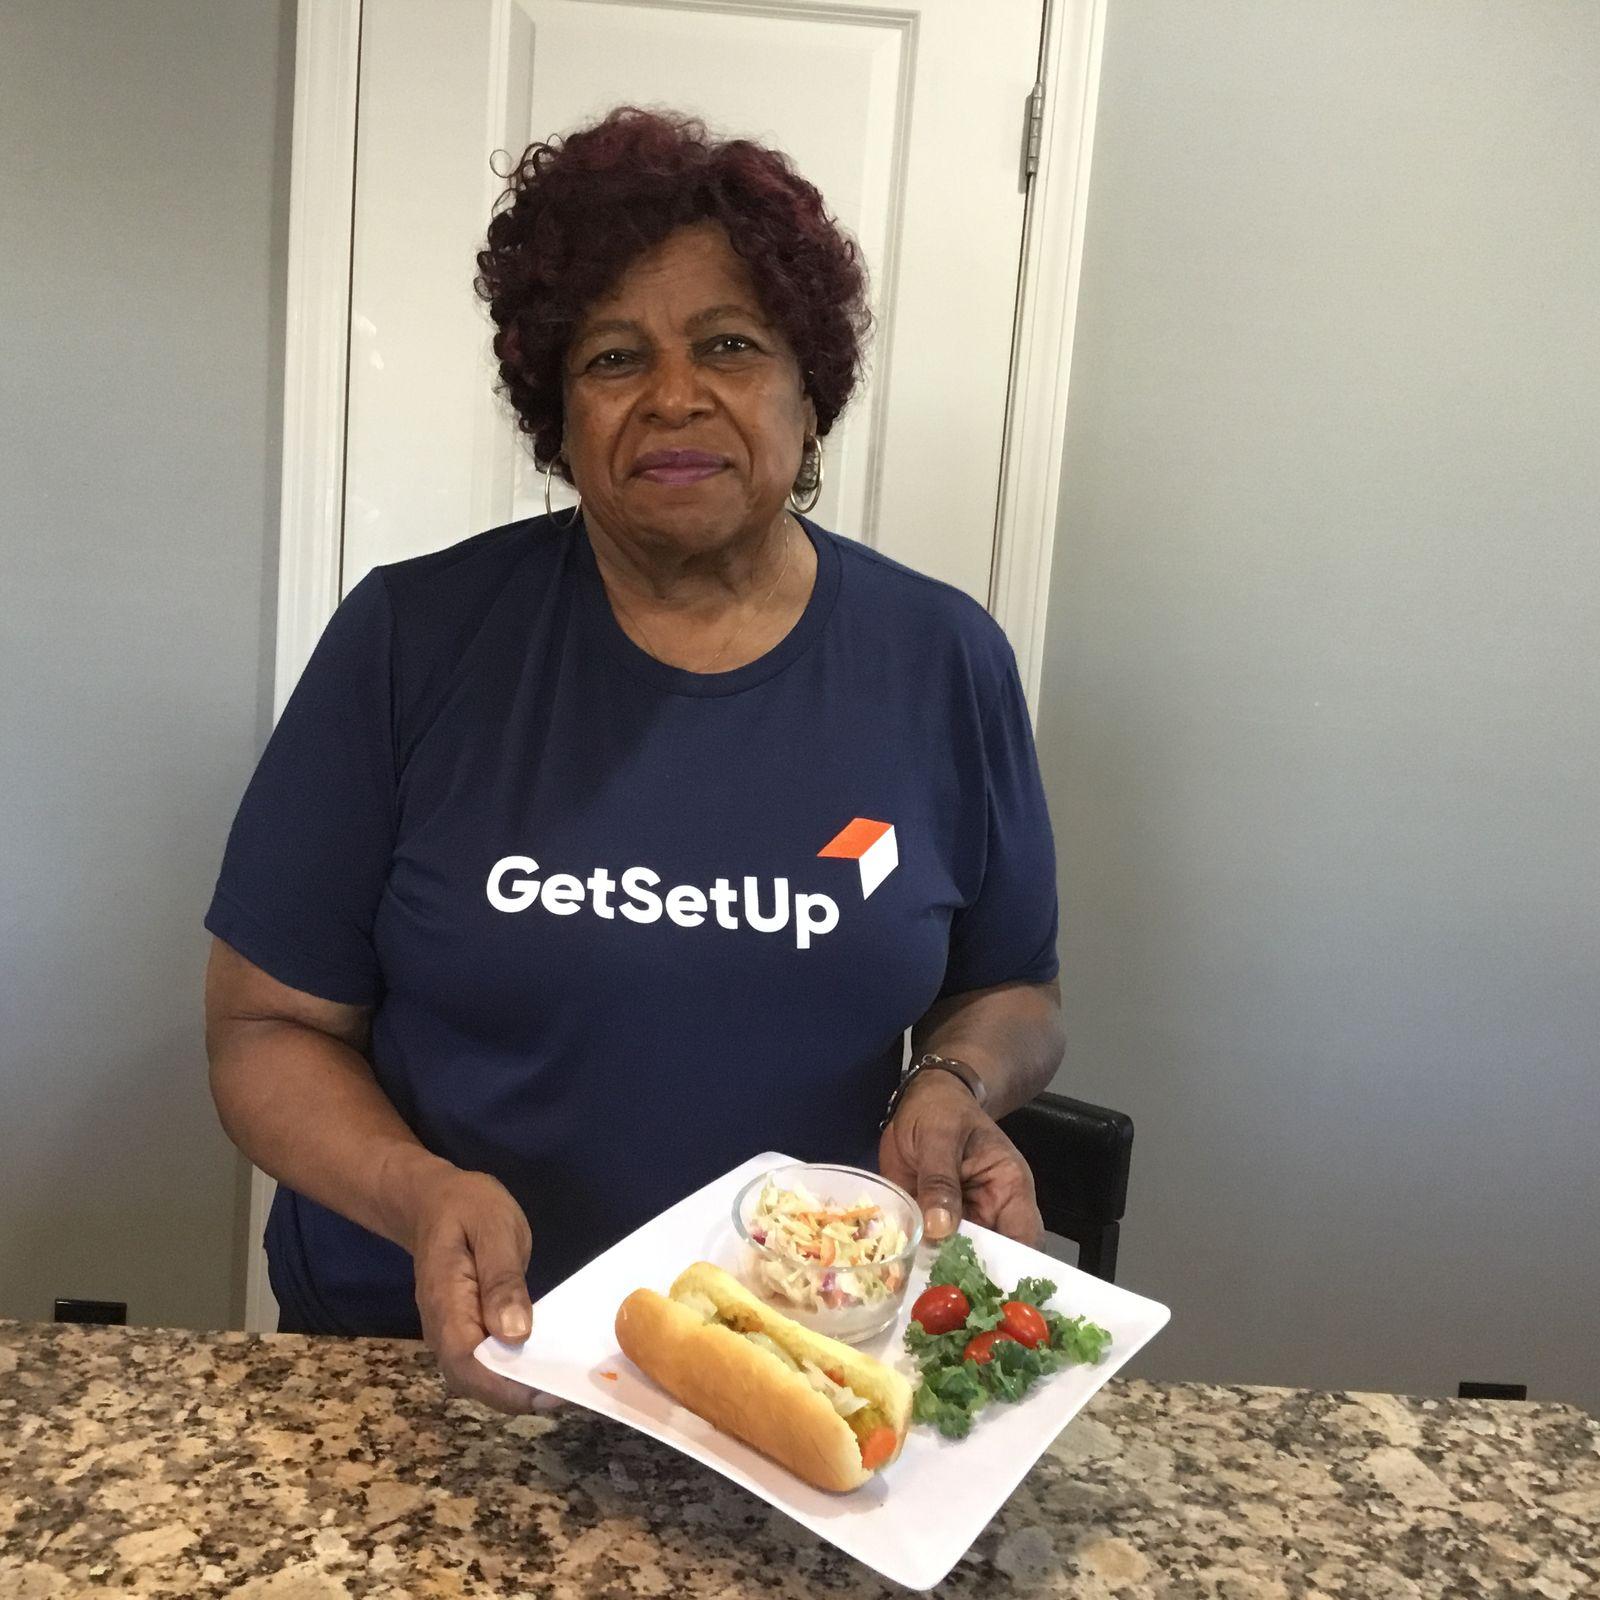 A. Marlene Finds True Heart In Her GetSetUp Community